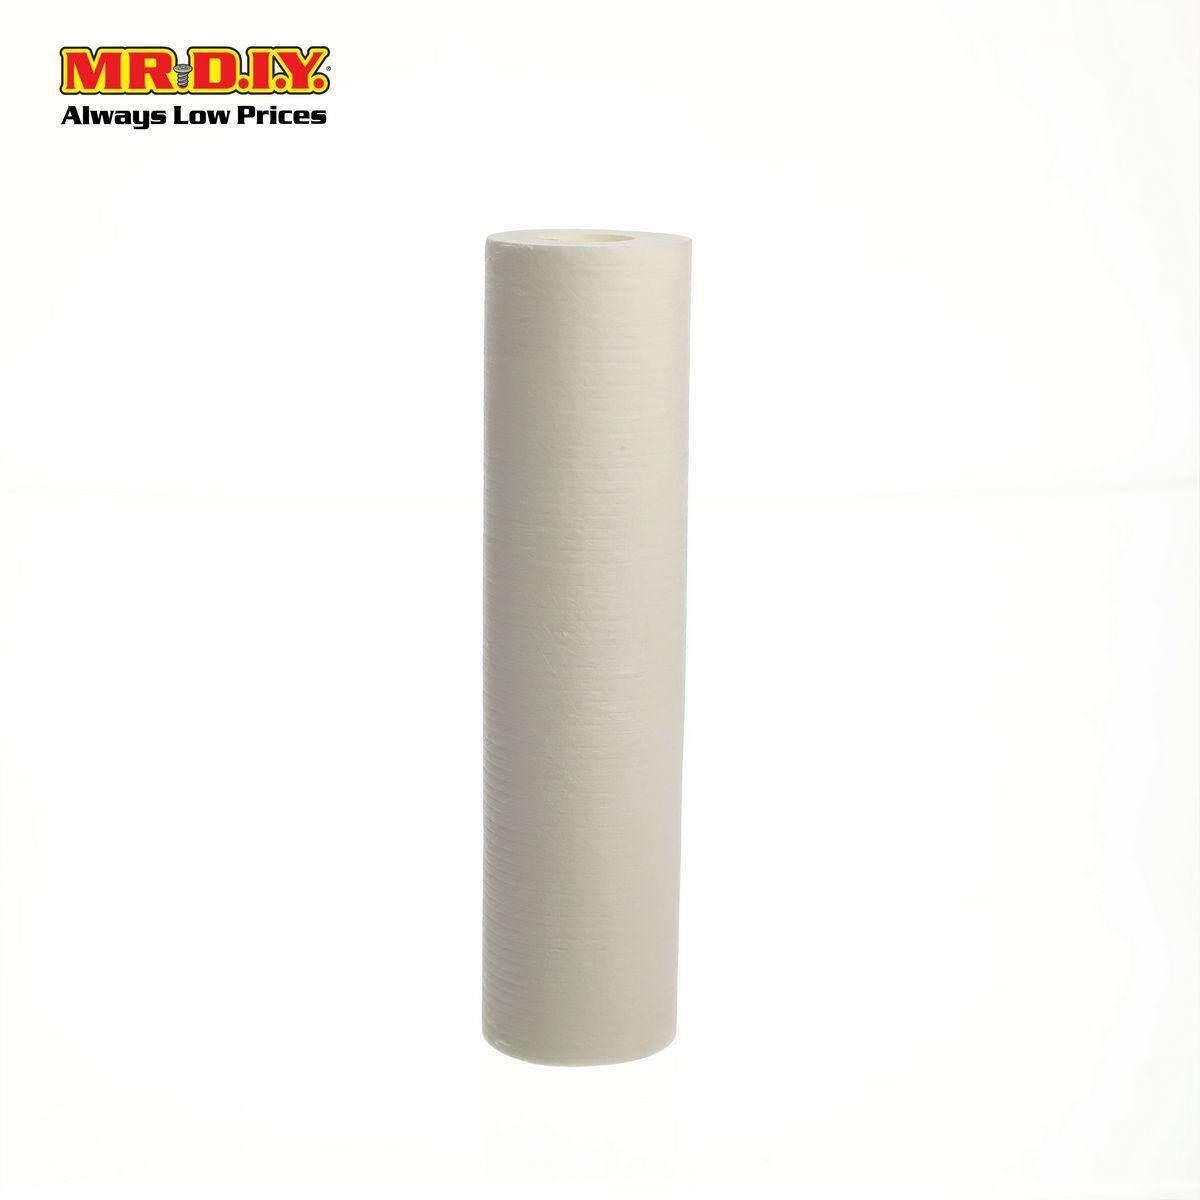 Indoor Water Filter Pp Cartridge 10 By Mr Diy.